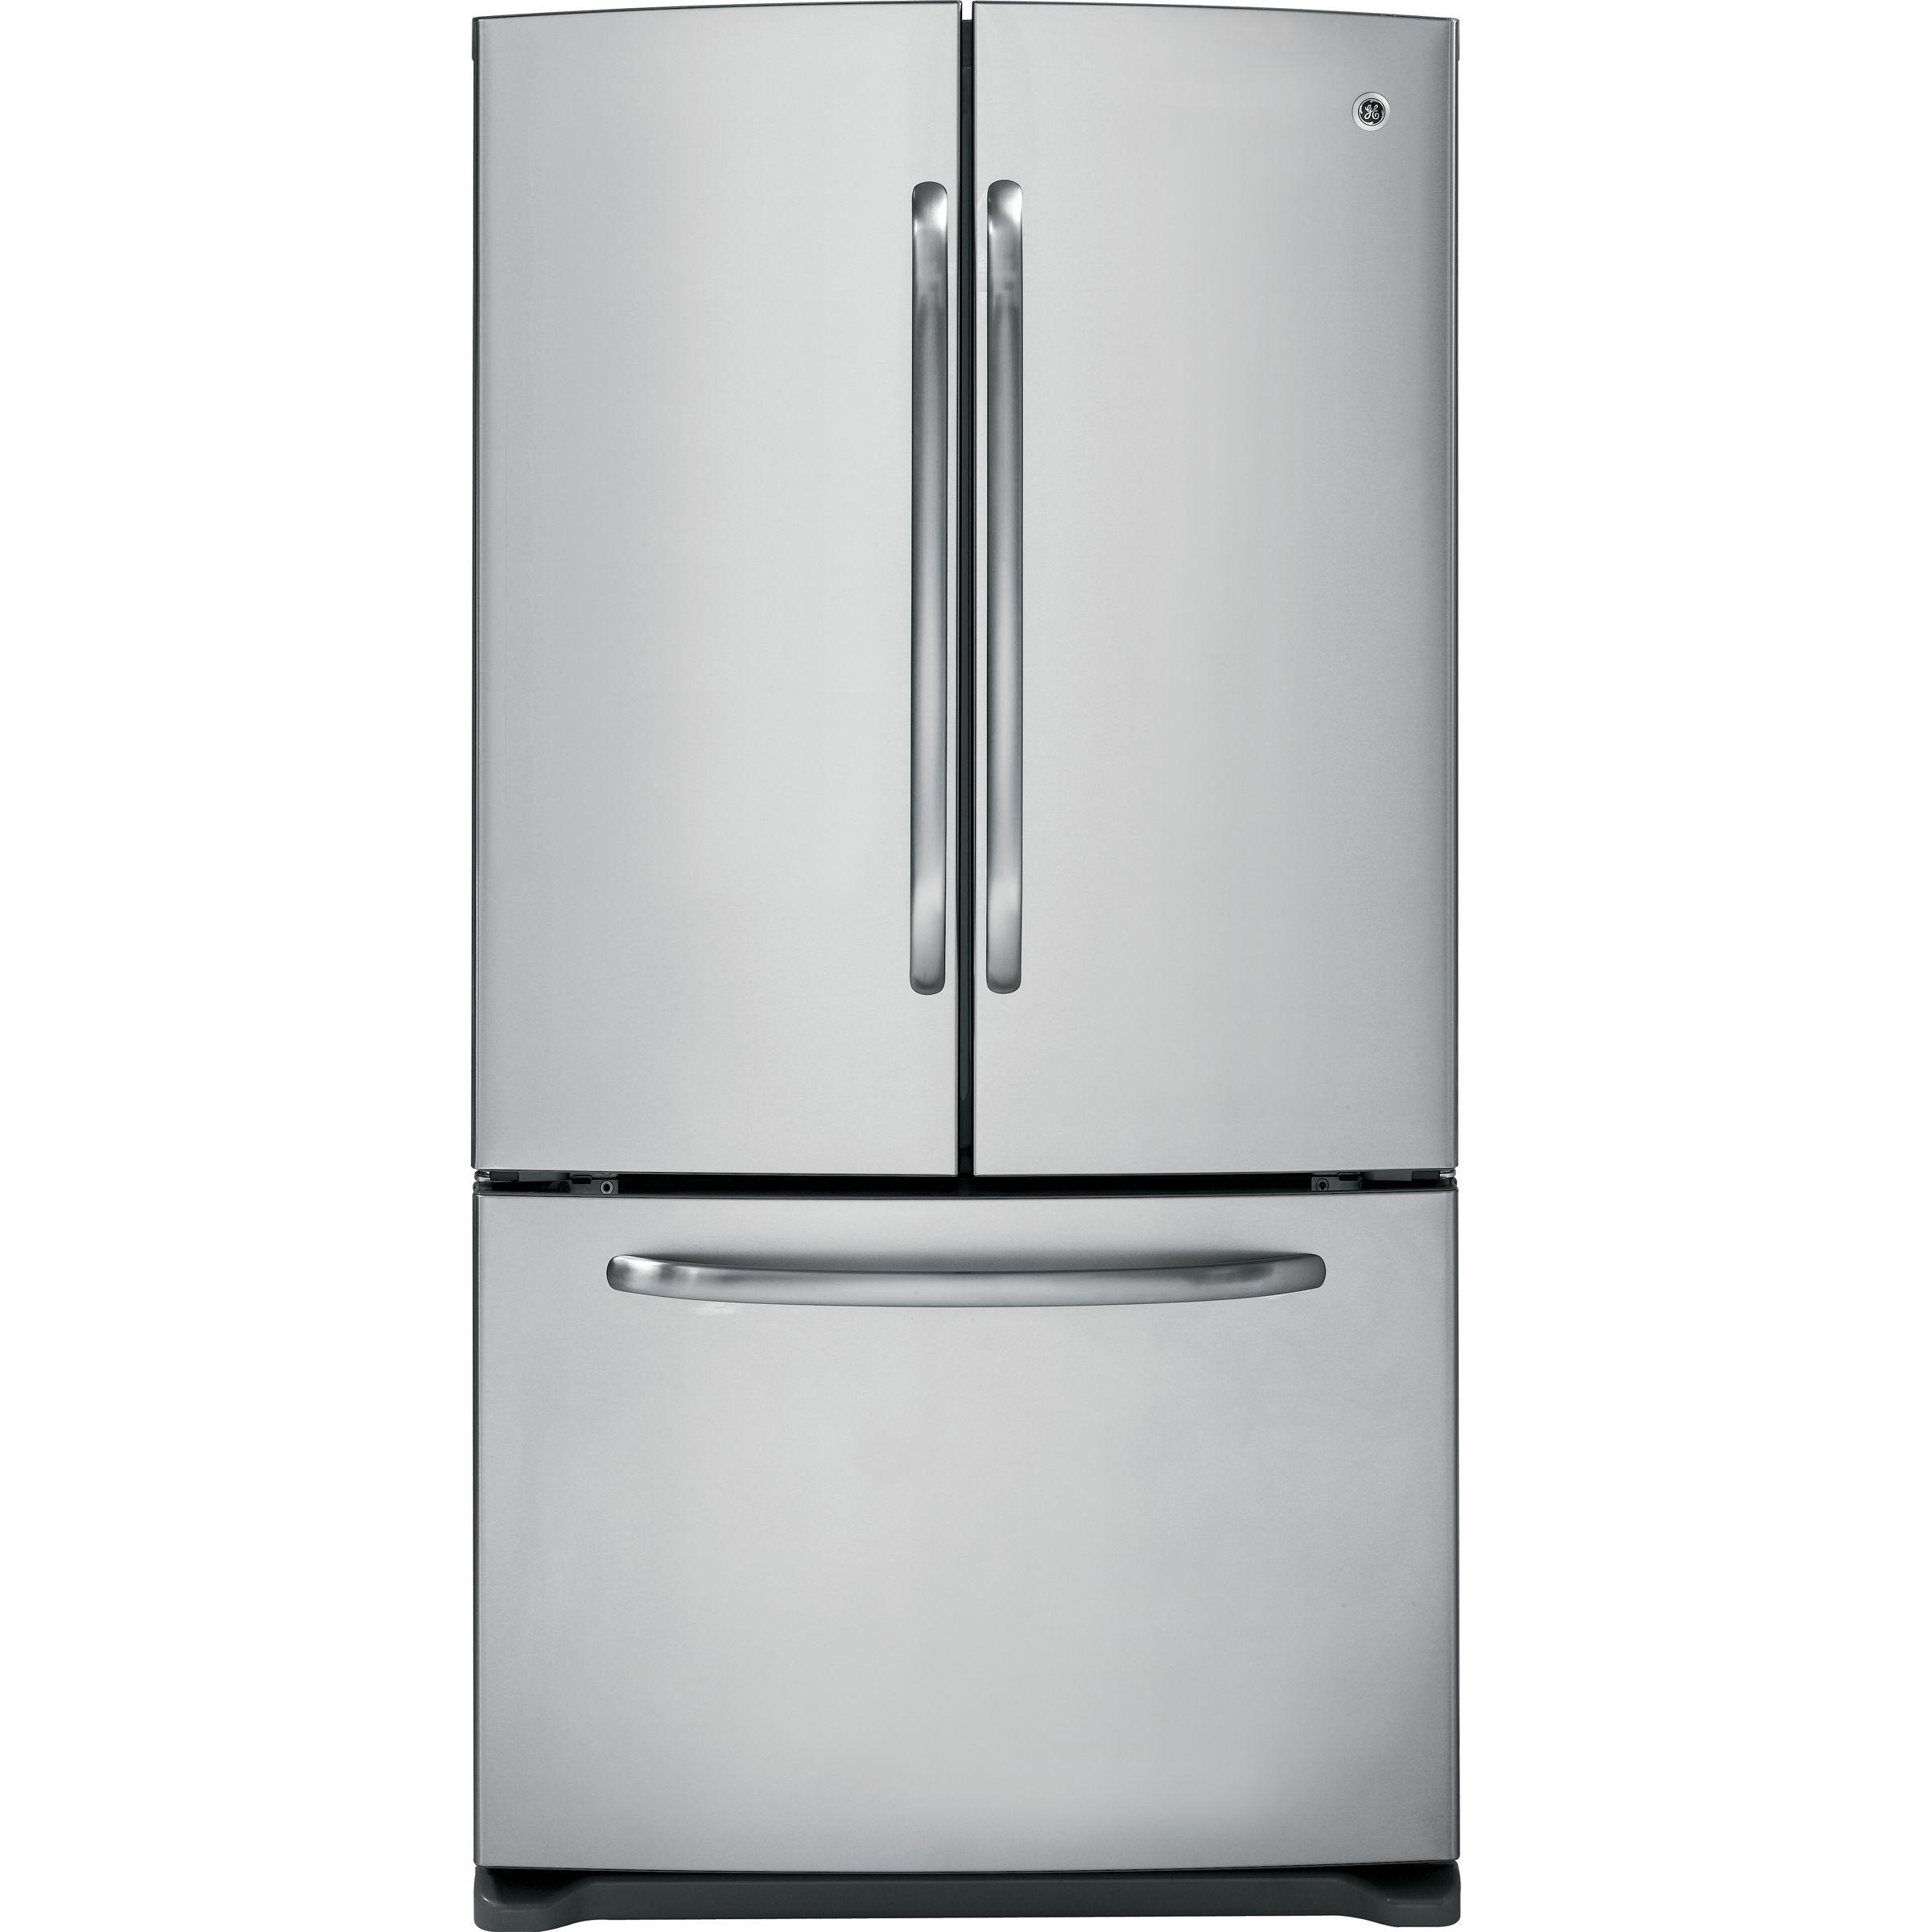 French-Door Refrigerator (GFSS6KEX)  sc 1 st  Hotpoint Fridge Freezers & Hotpoint Fridge Freezers - GE 25.8 cu. ft. French-Door Refrigerator ...